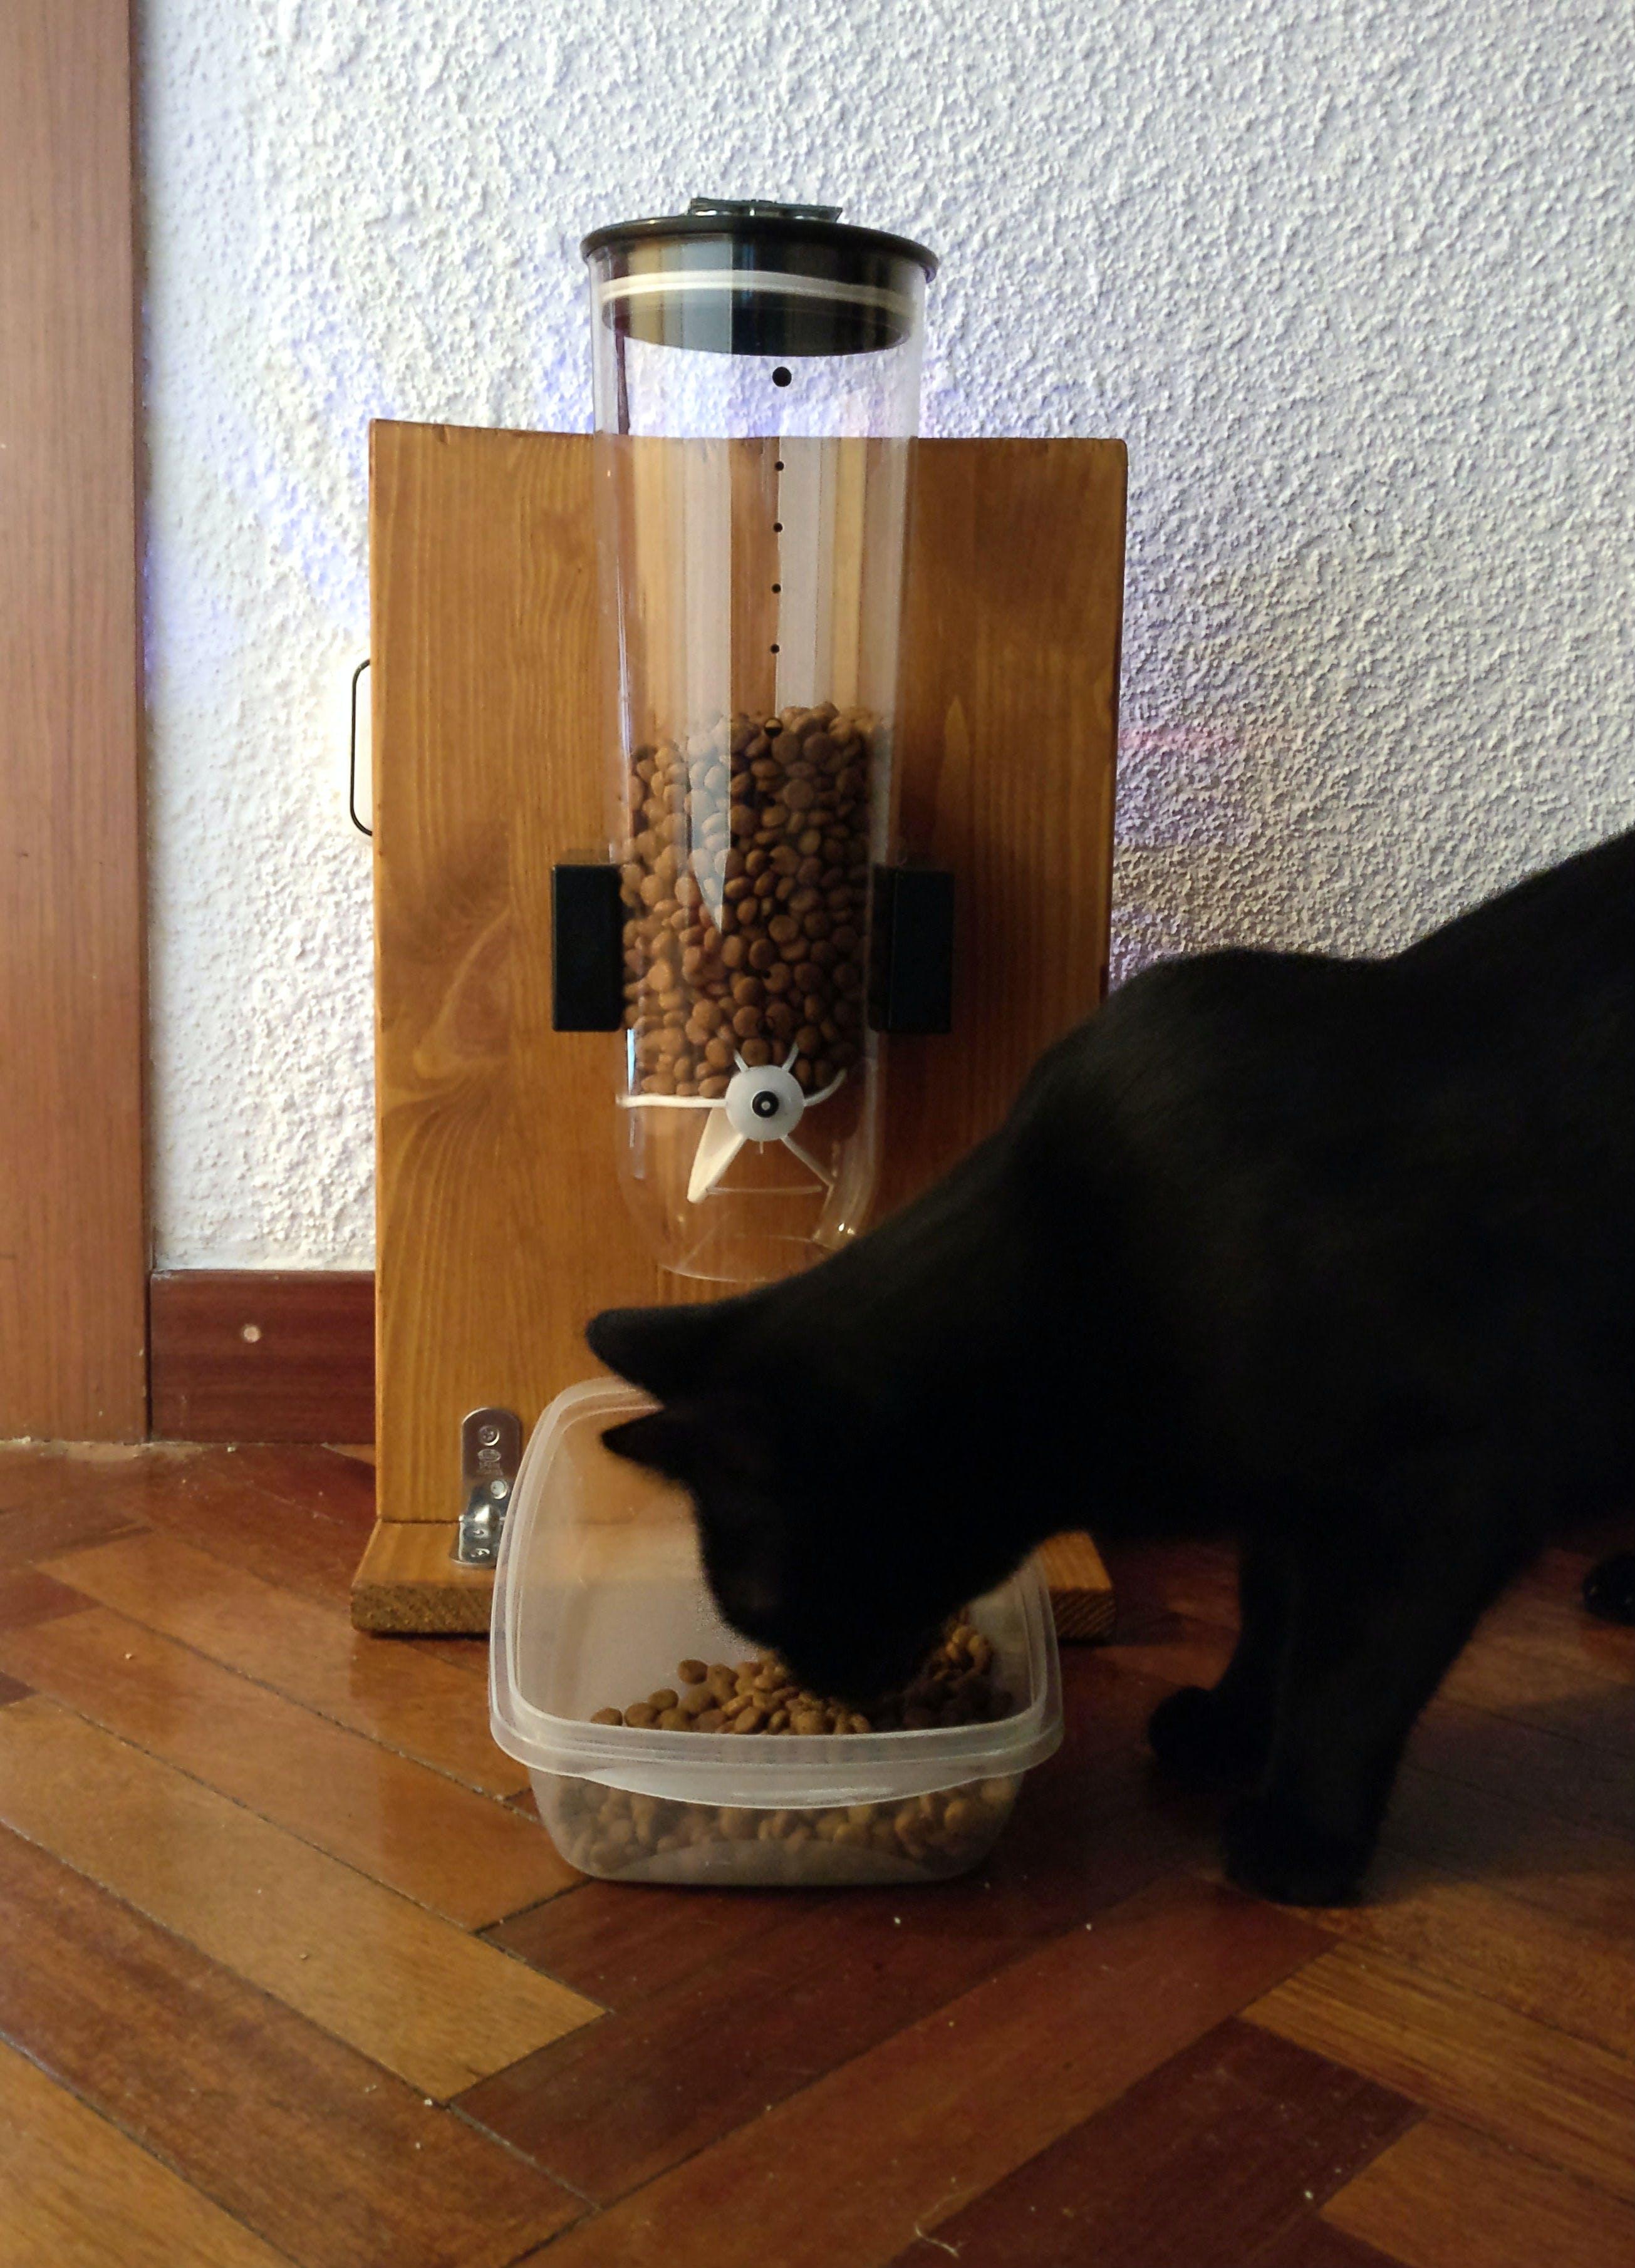 My colleague Bagheera enjoying her brand new catFeeder!